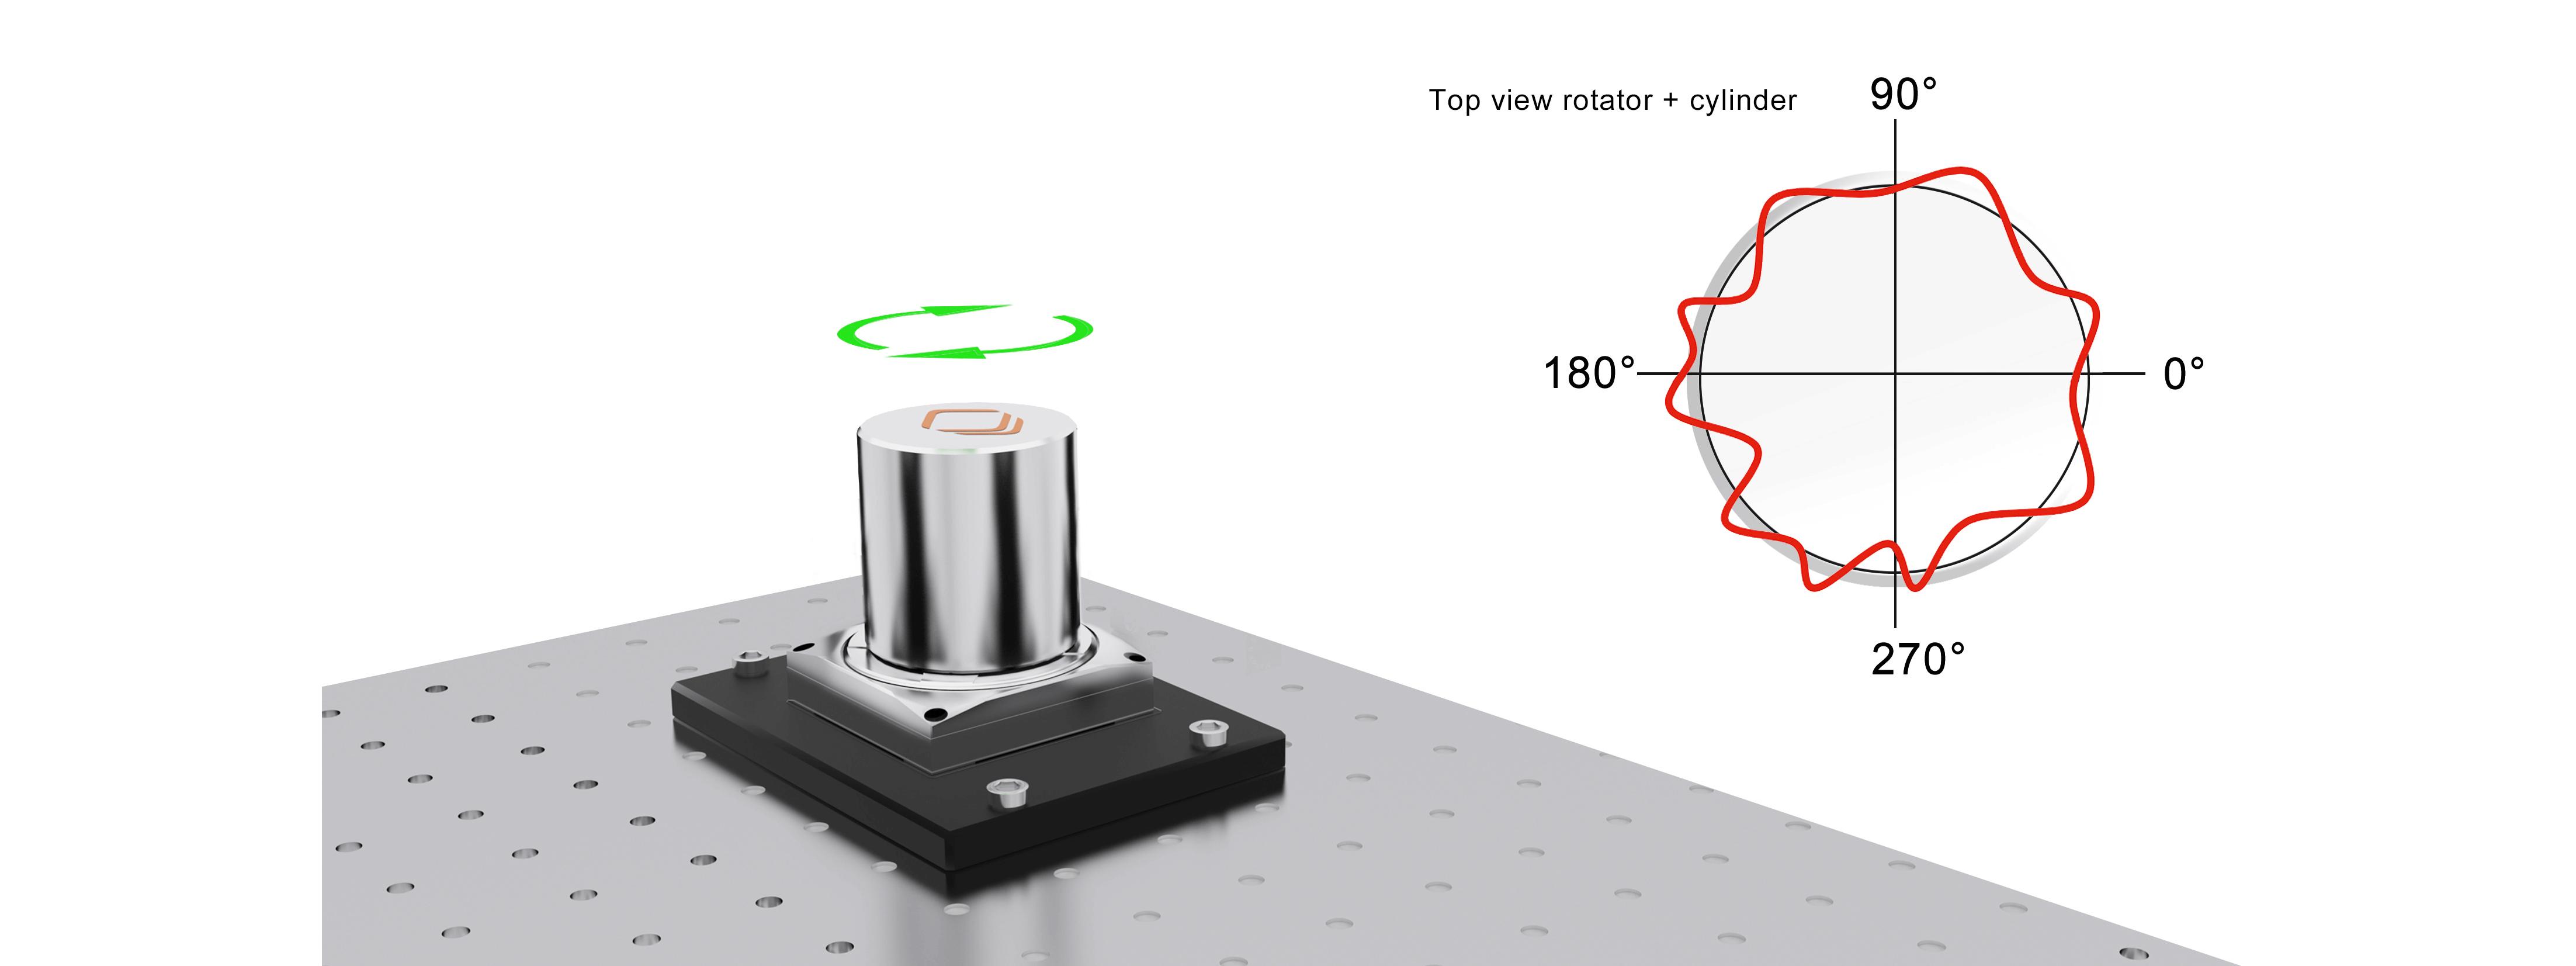 Rotation-Compensation-1.png